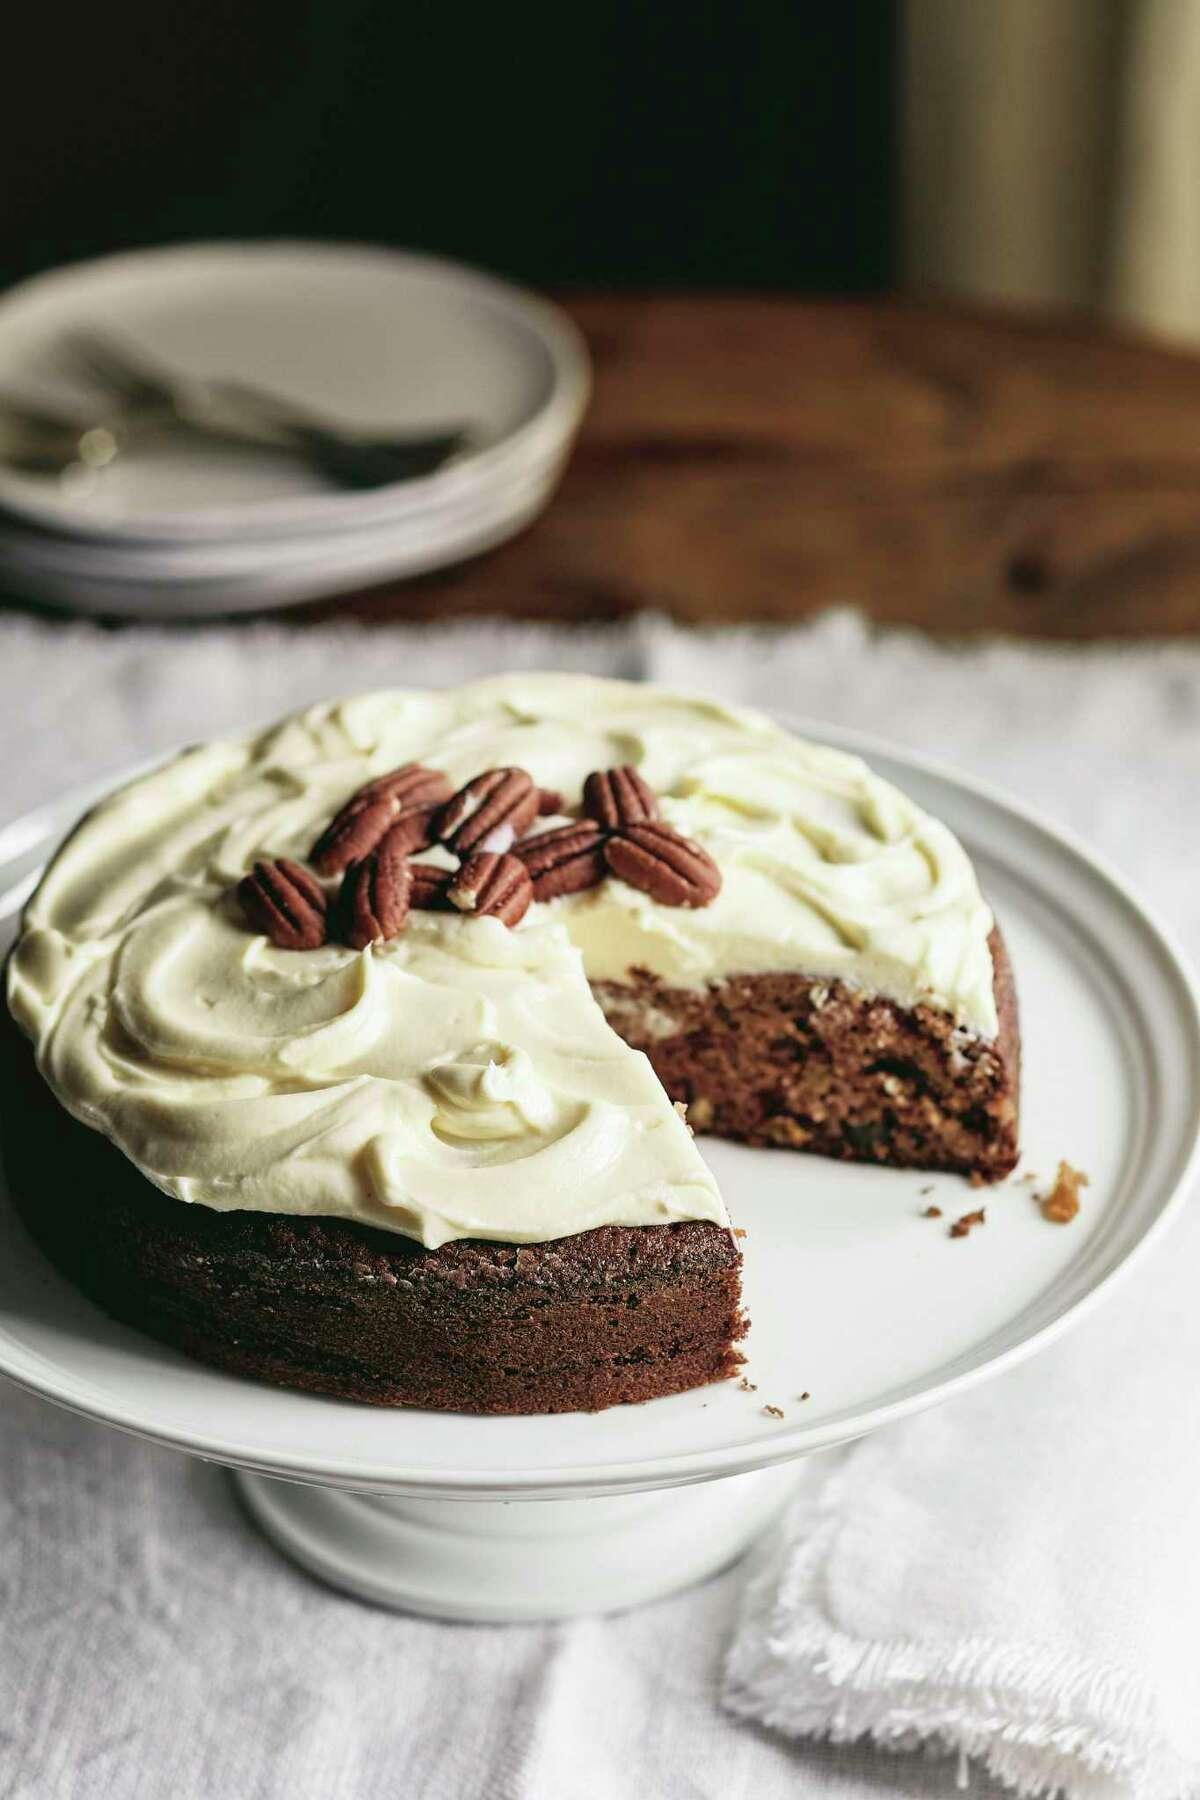 Applesauce Cake with Bourbon Raisins from